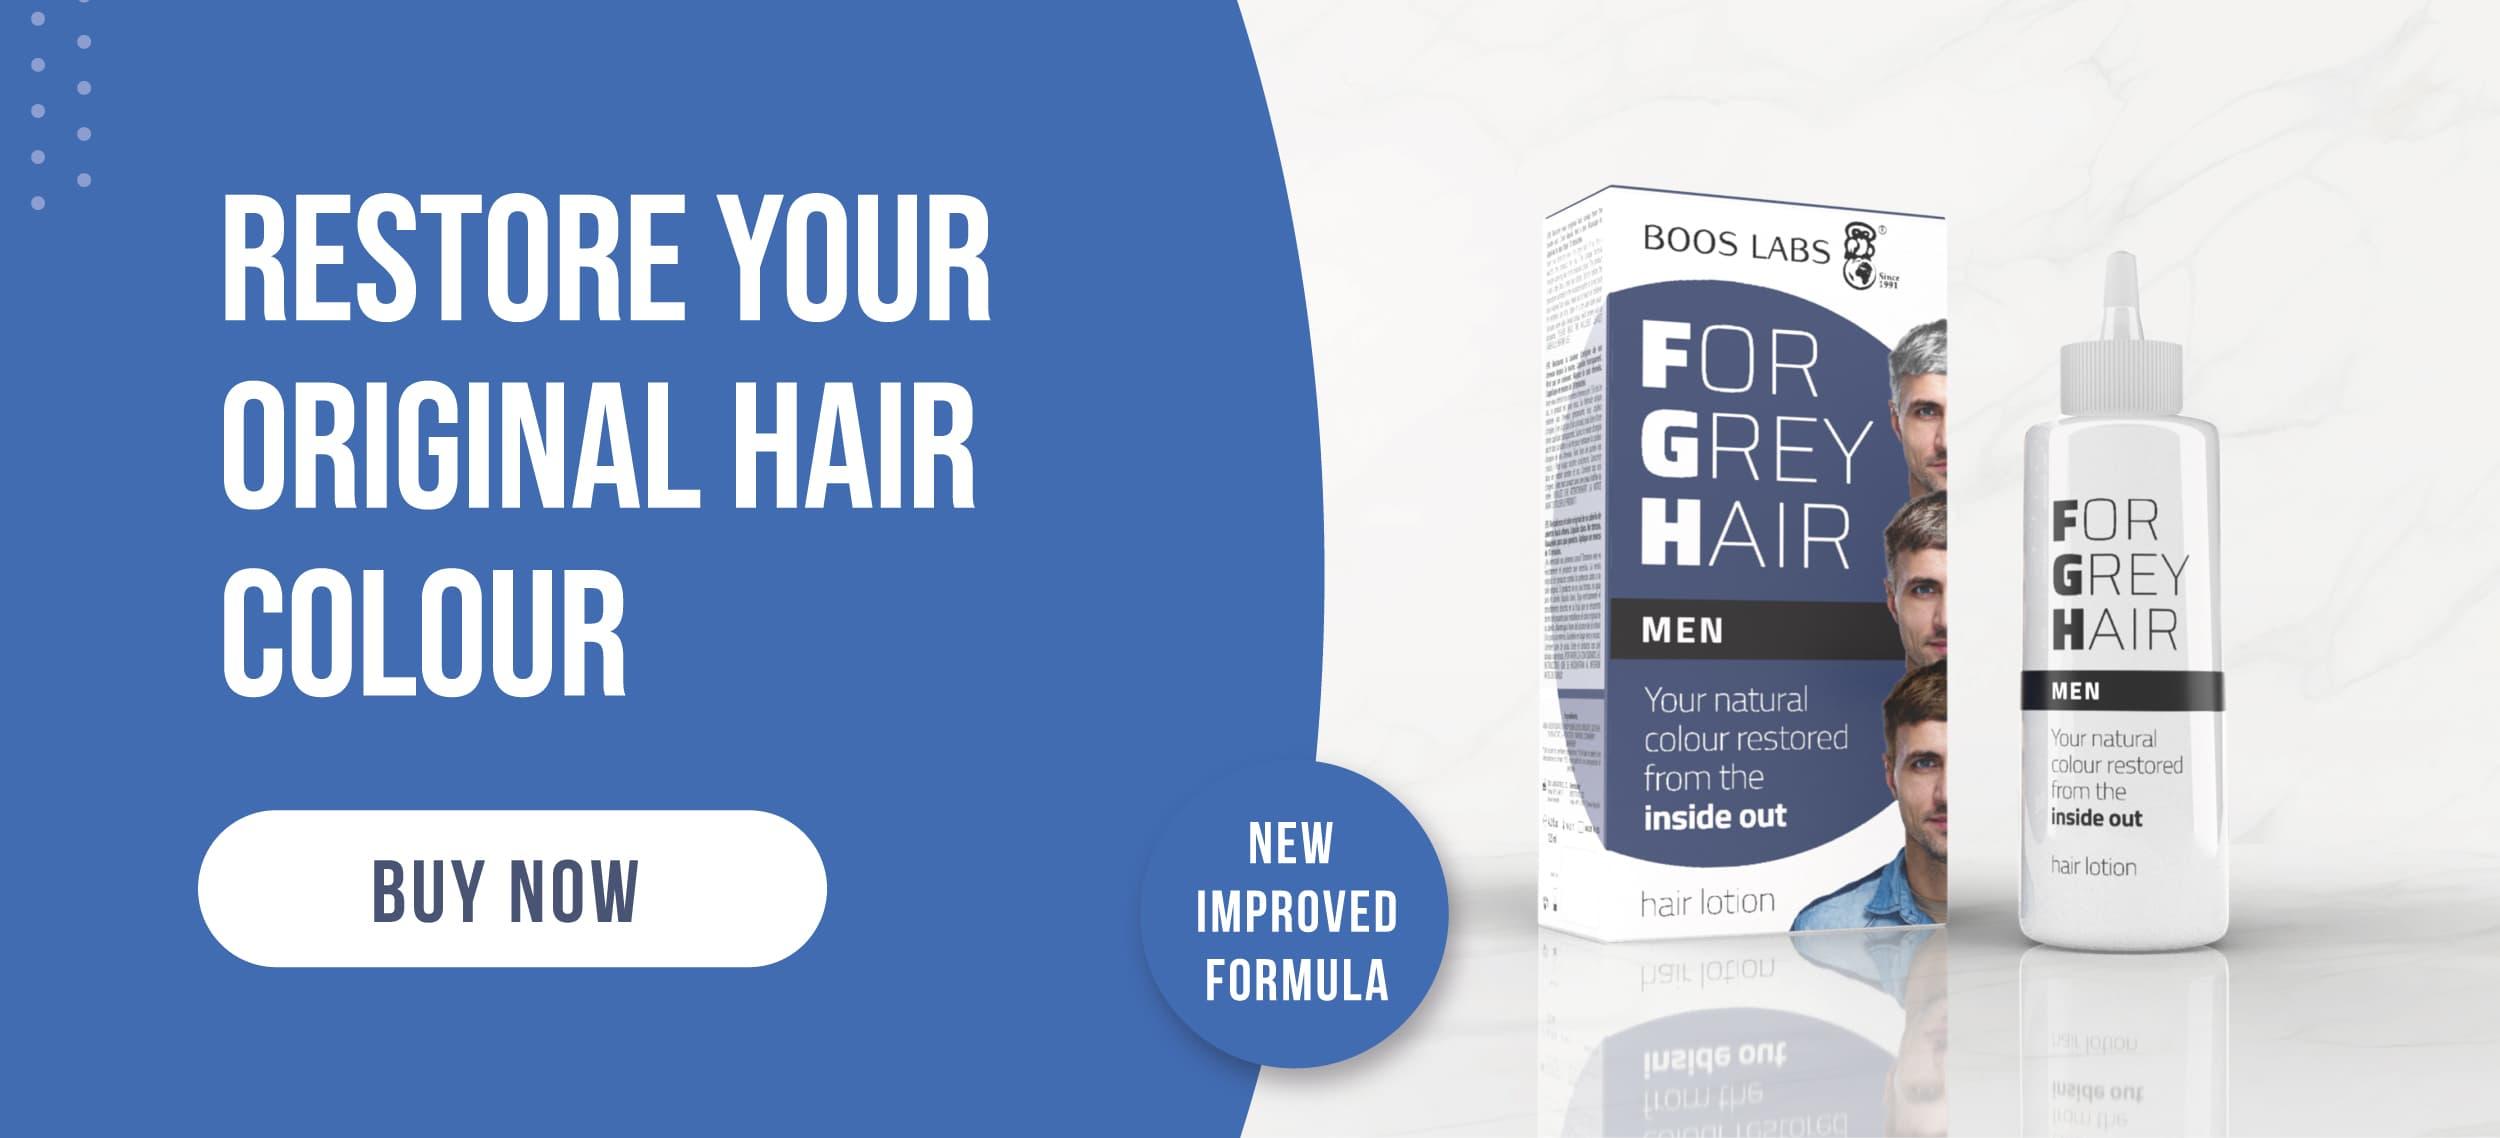 For grey hair